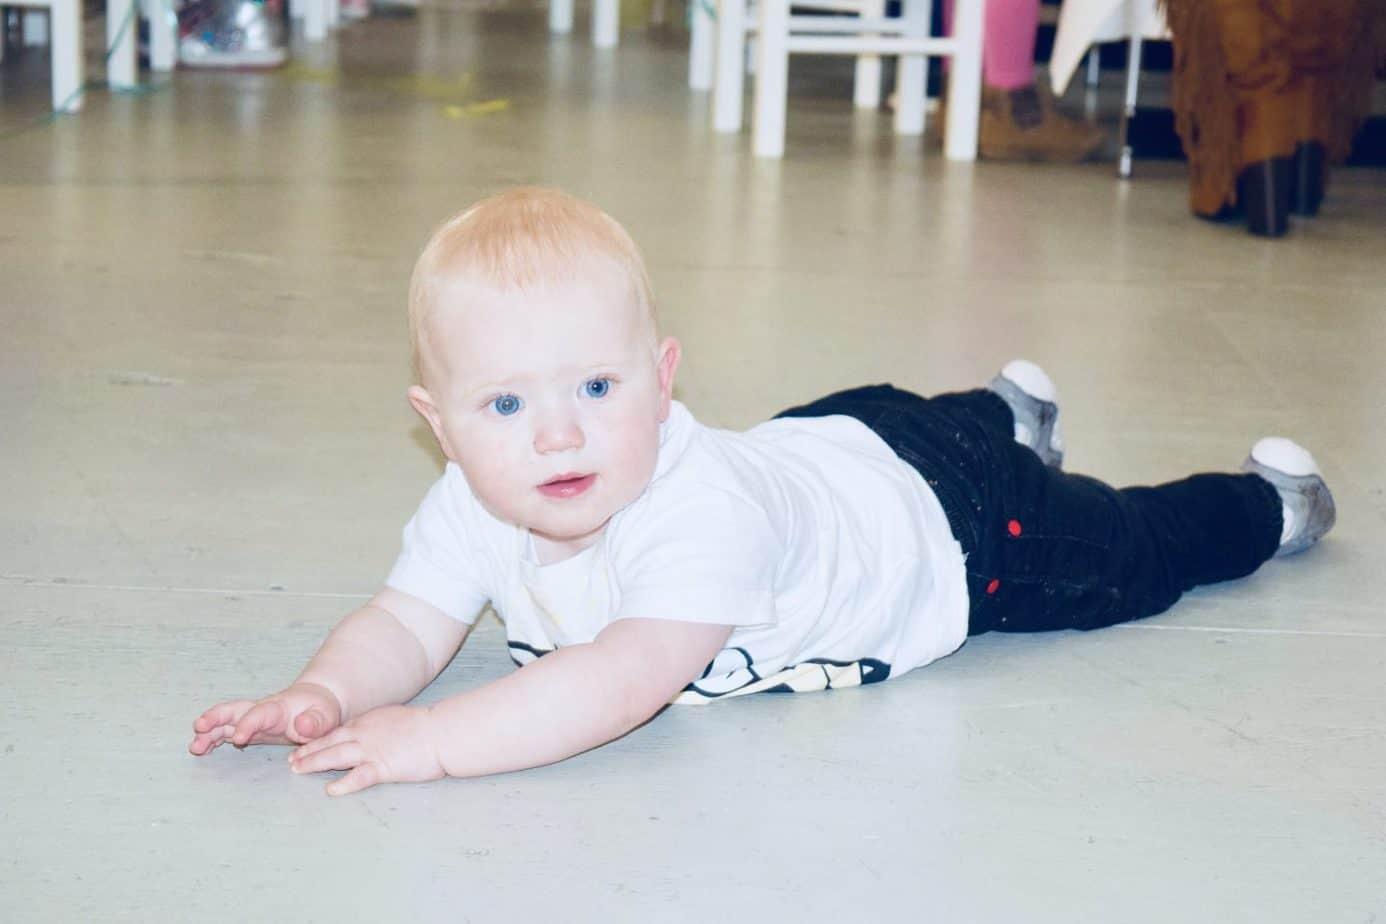 Baby K on the floor at Yellow Zebra Safaris event